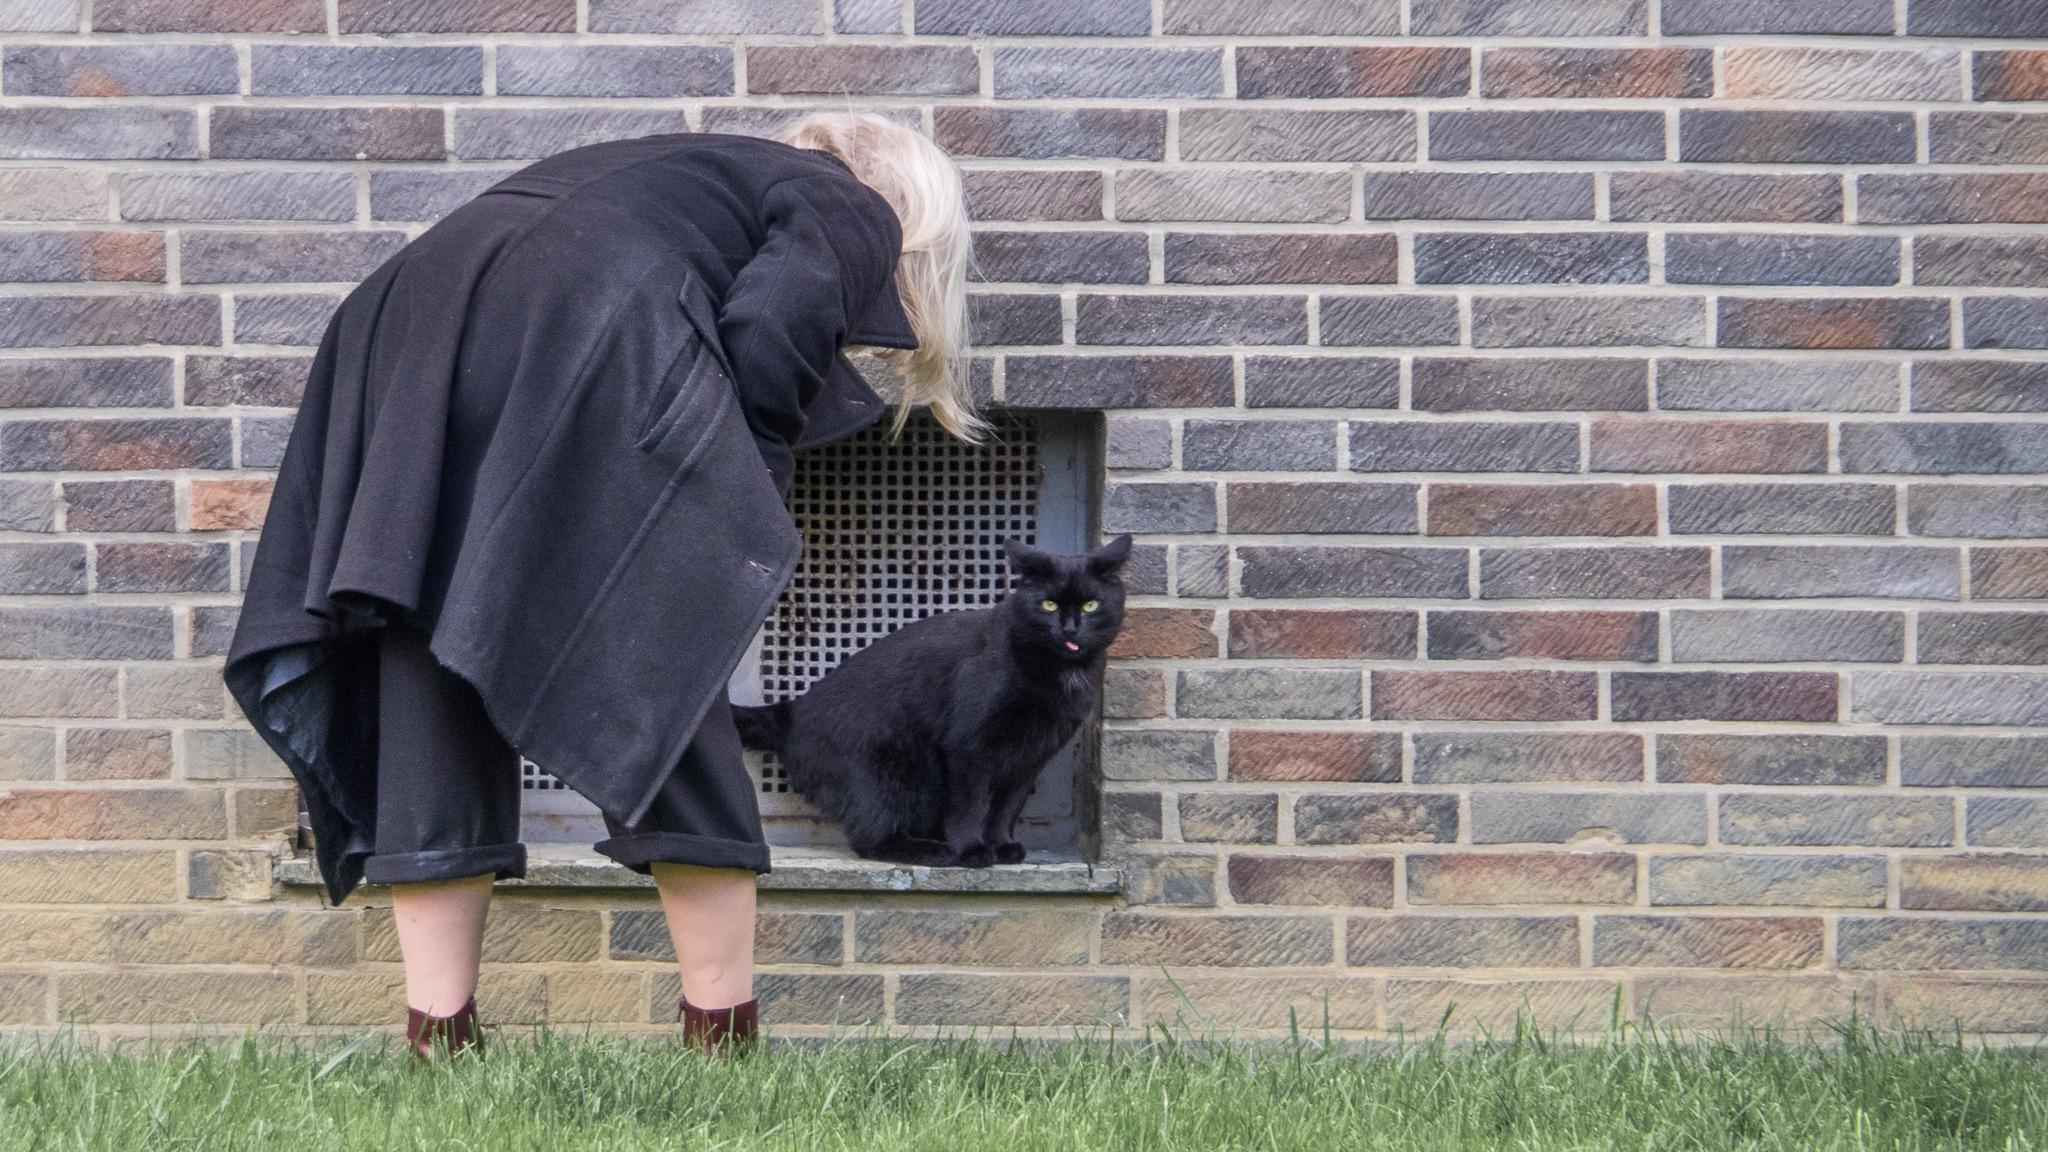 The Cat by JohannesTonn